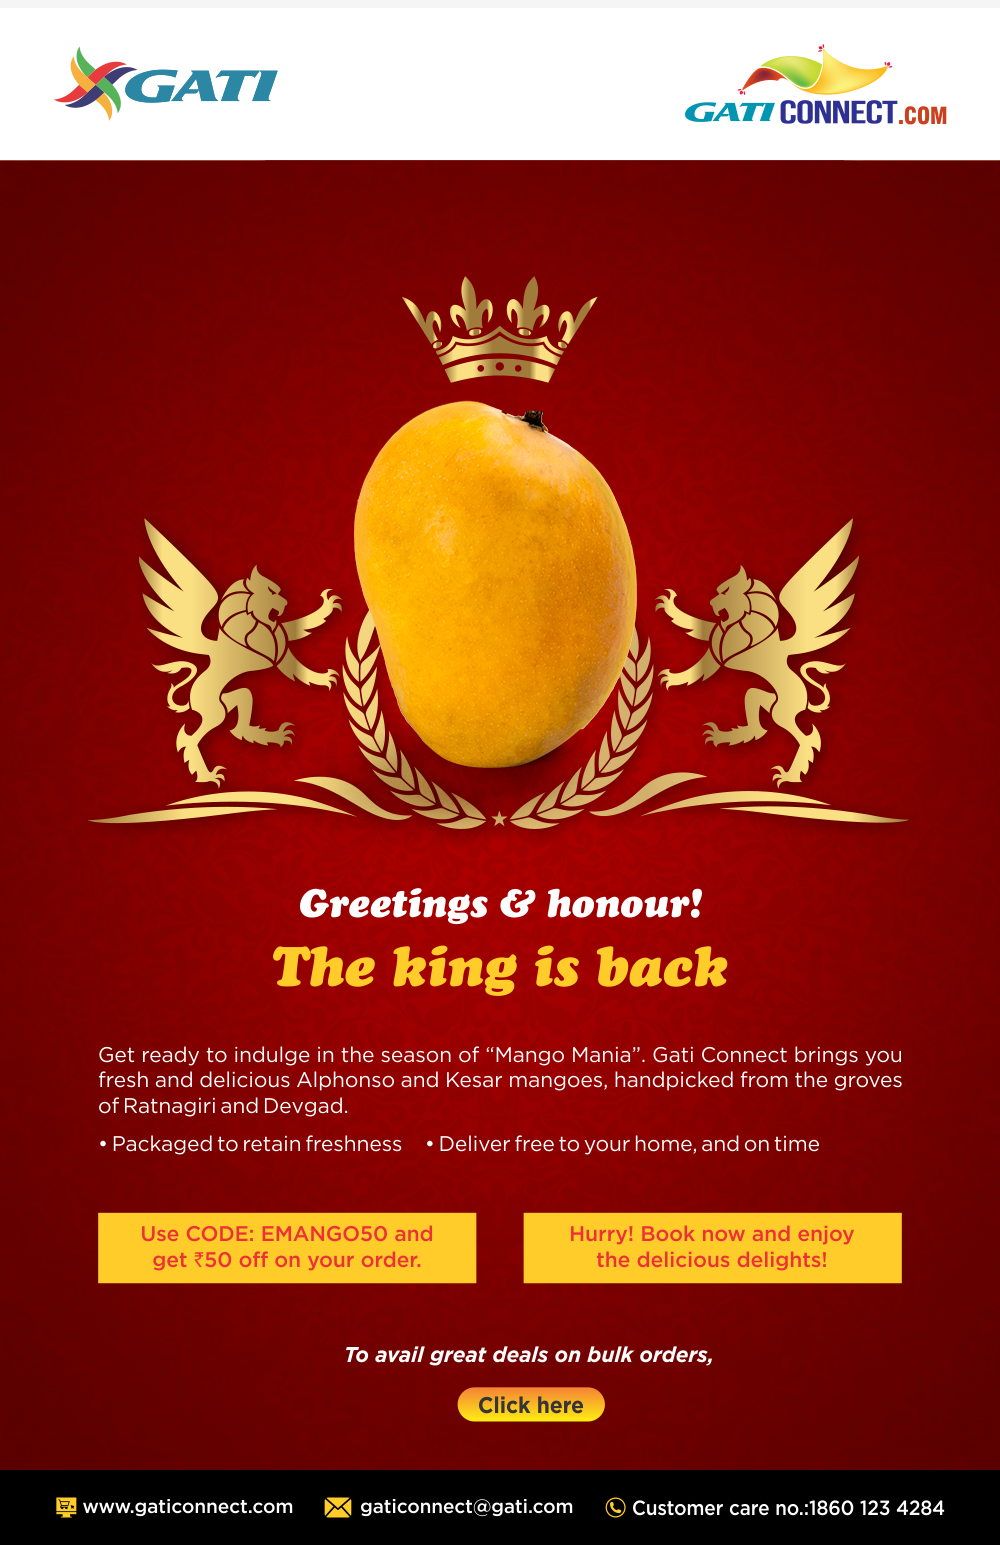 Dieta de toronja yahoo dating